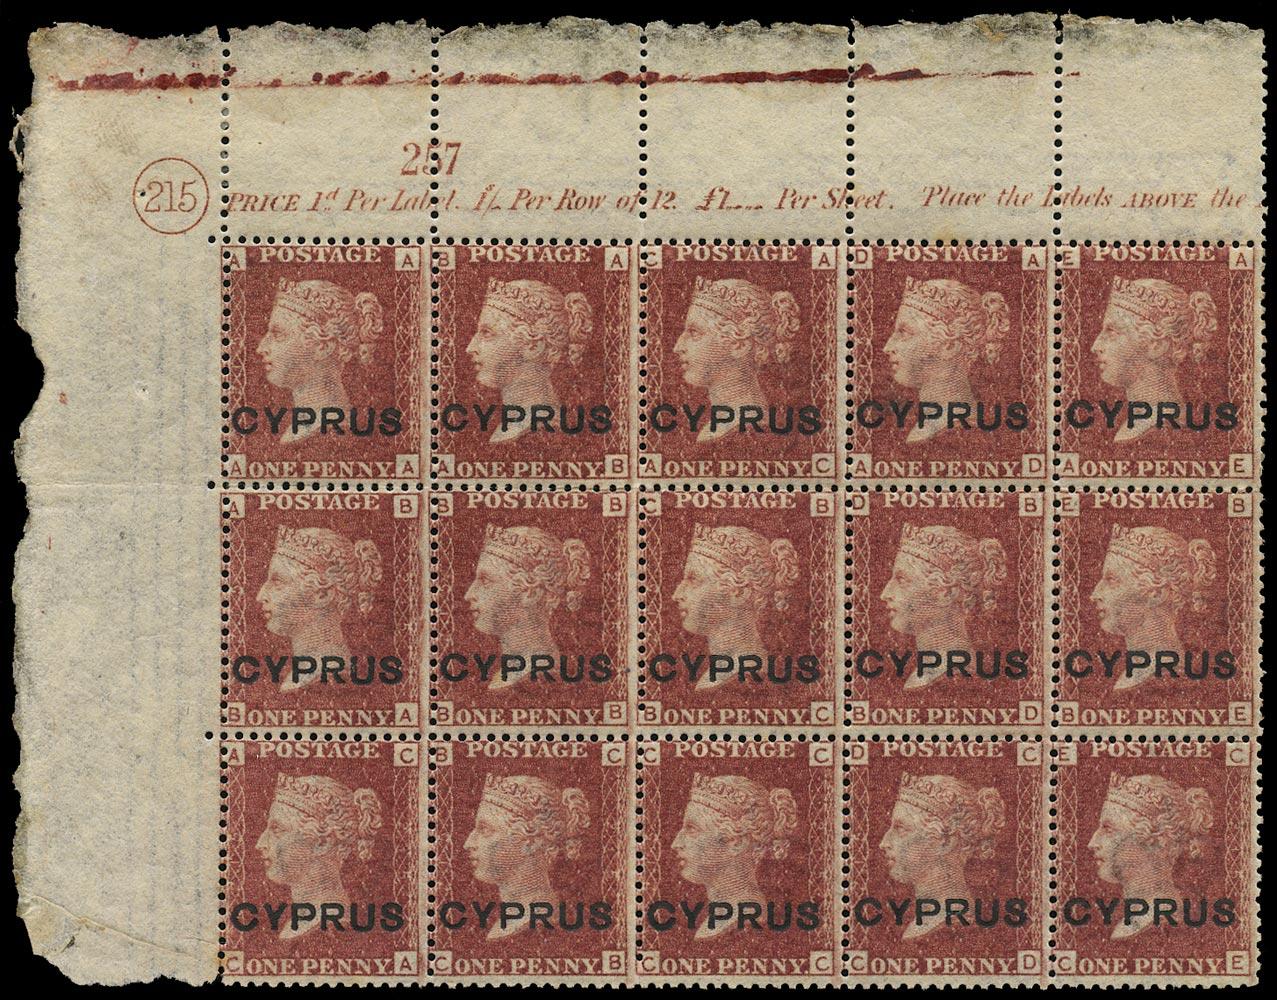 CYPRUS 1880  SG2 Mint Plate 215 Corner Block